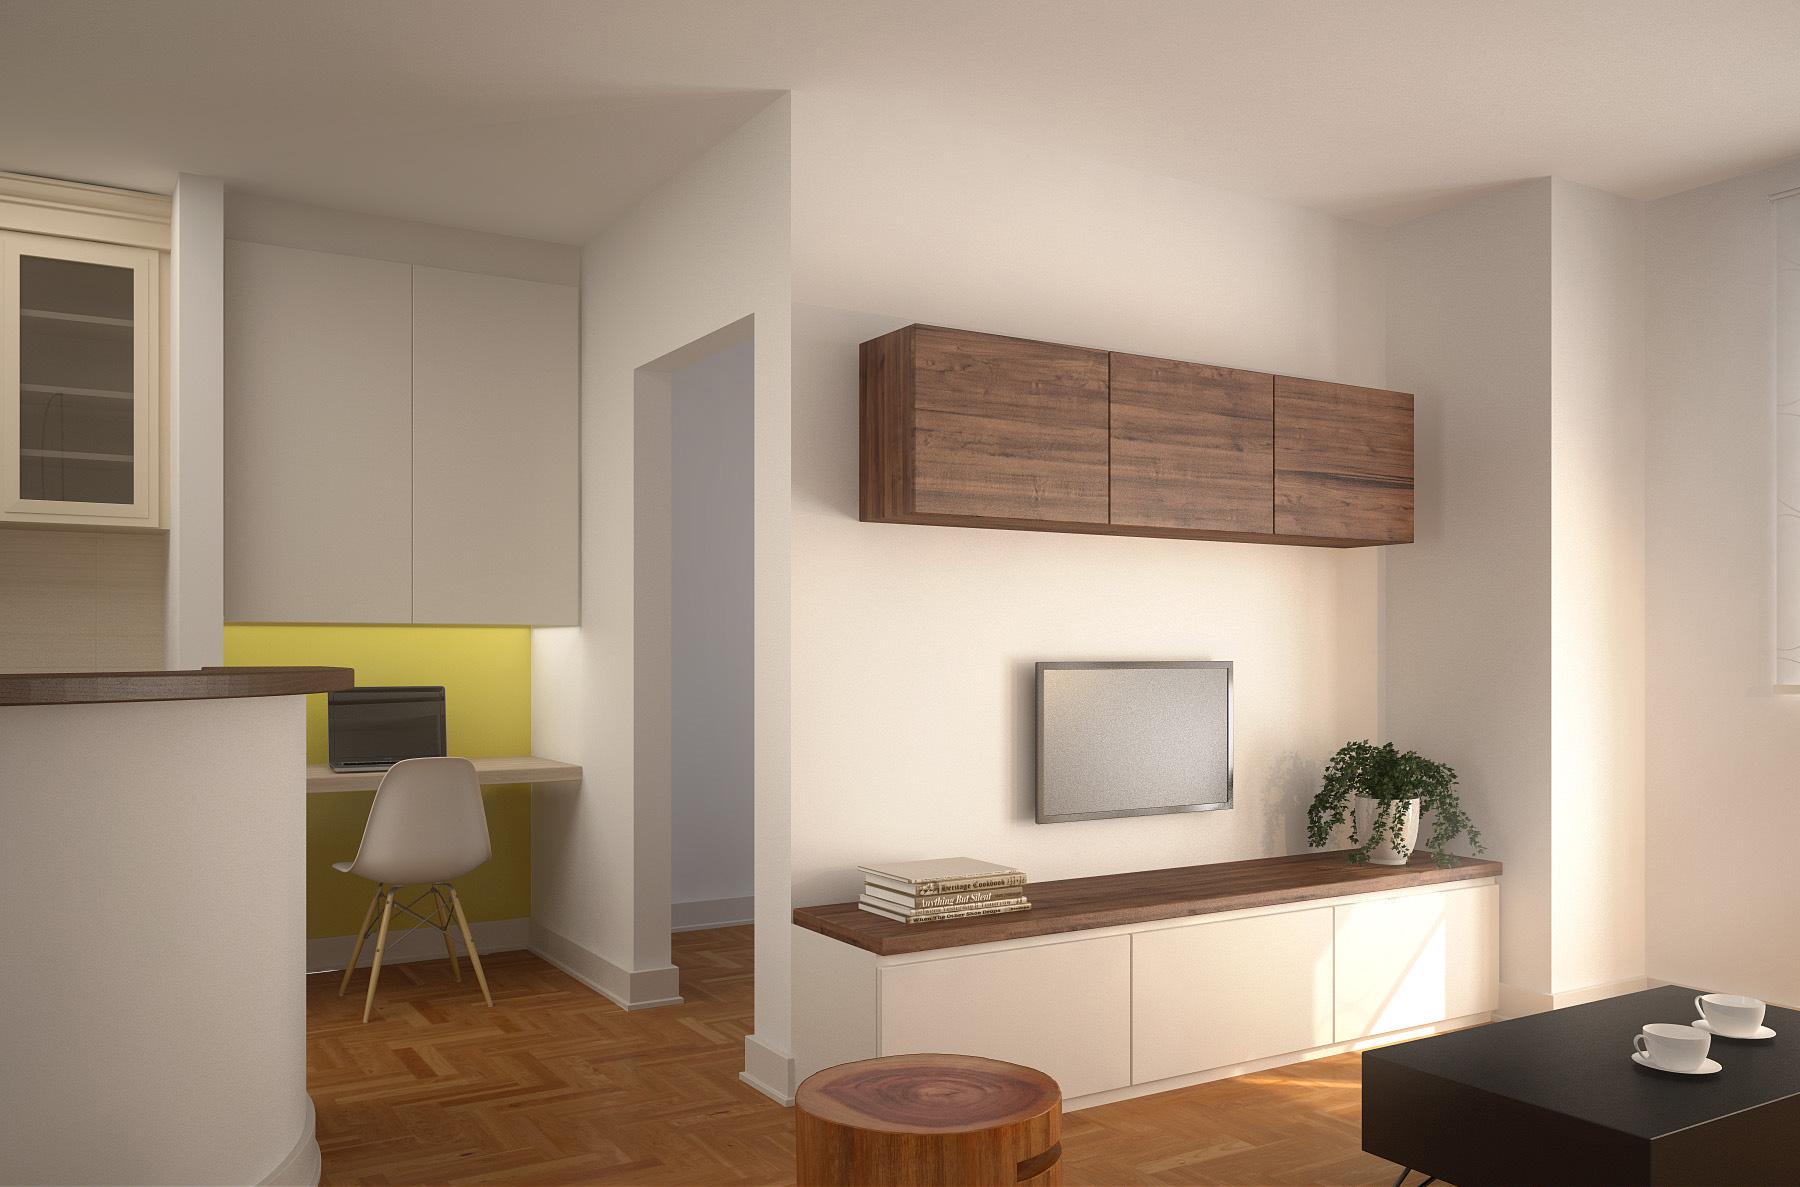 TiDj apartment